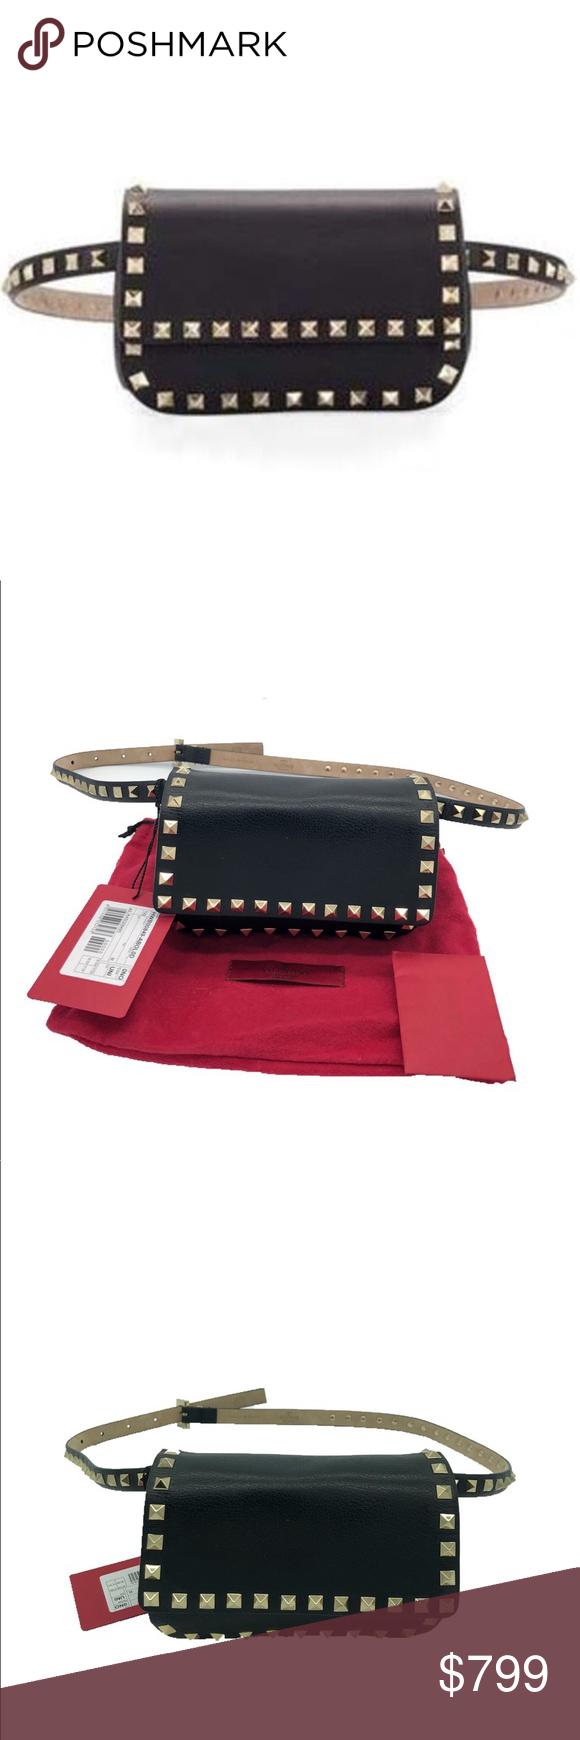 2890f4410 Valentino Rockstud Waist Bag Fanny Pack Valentino Garavani leather waist bag  with signature Rockstud trim.